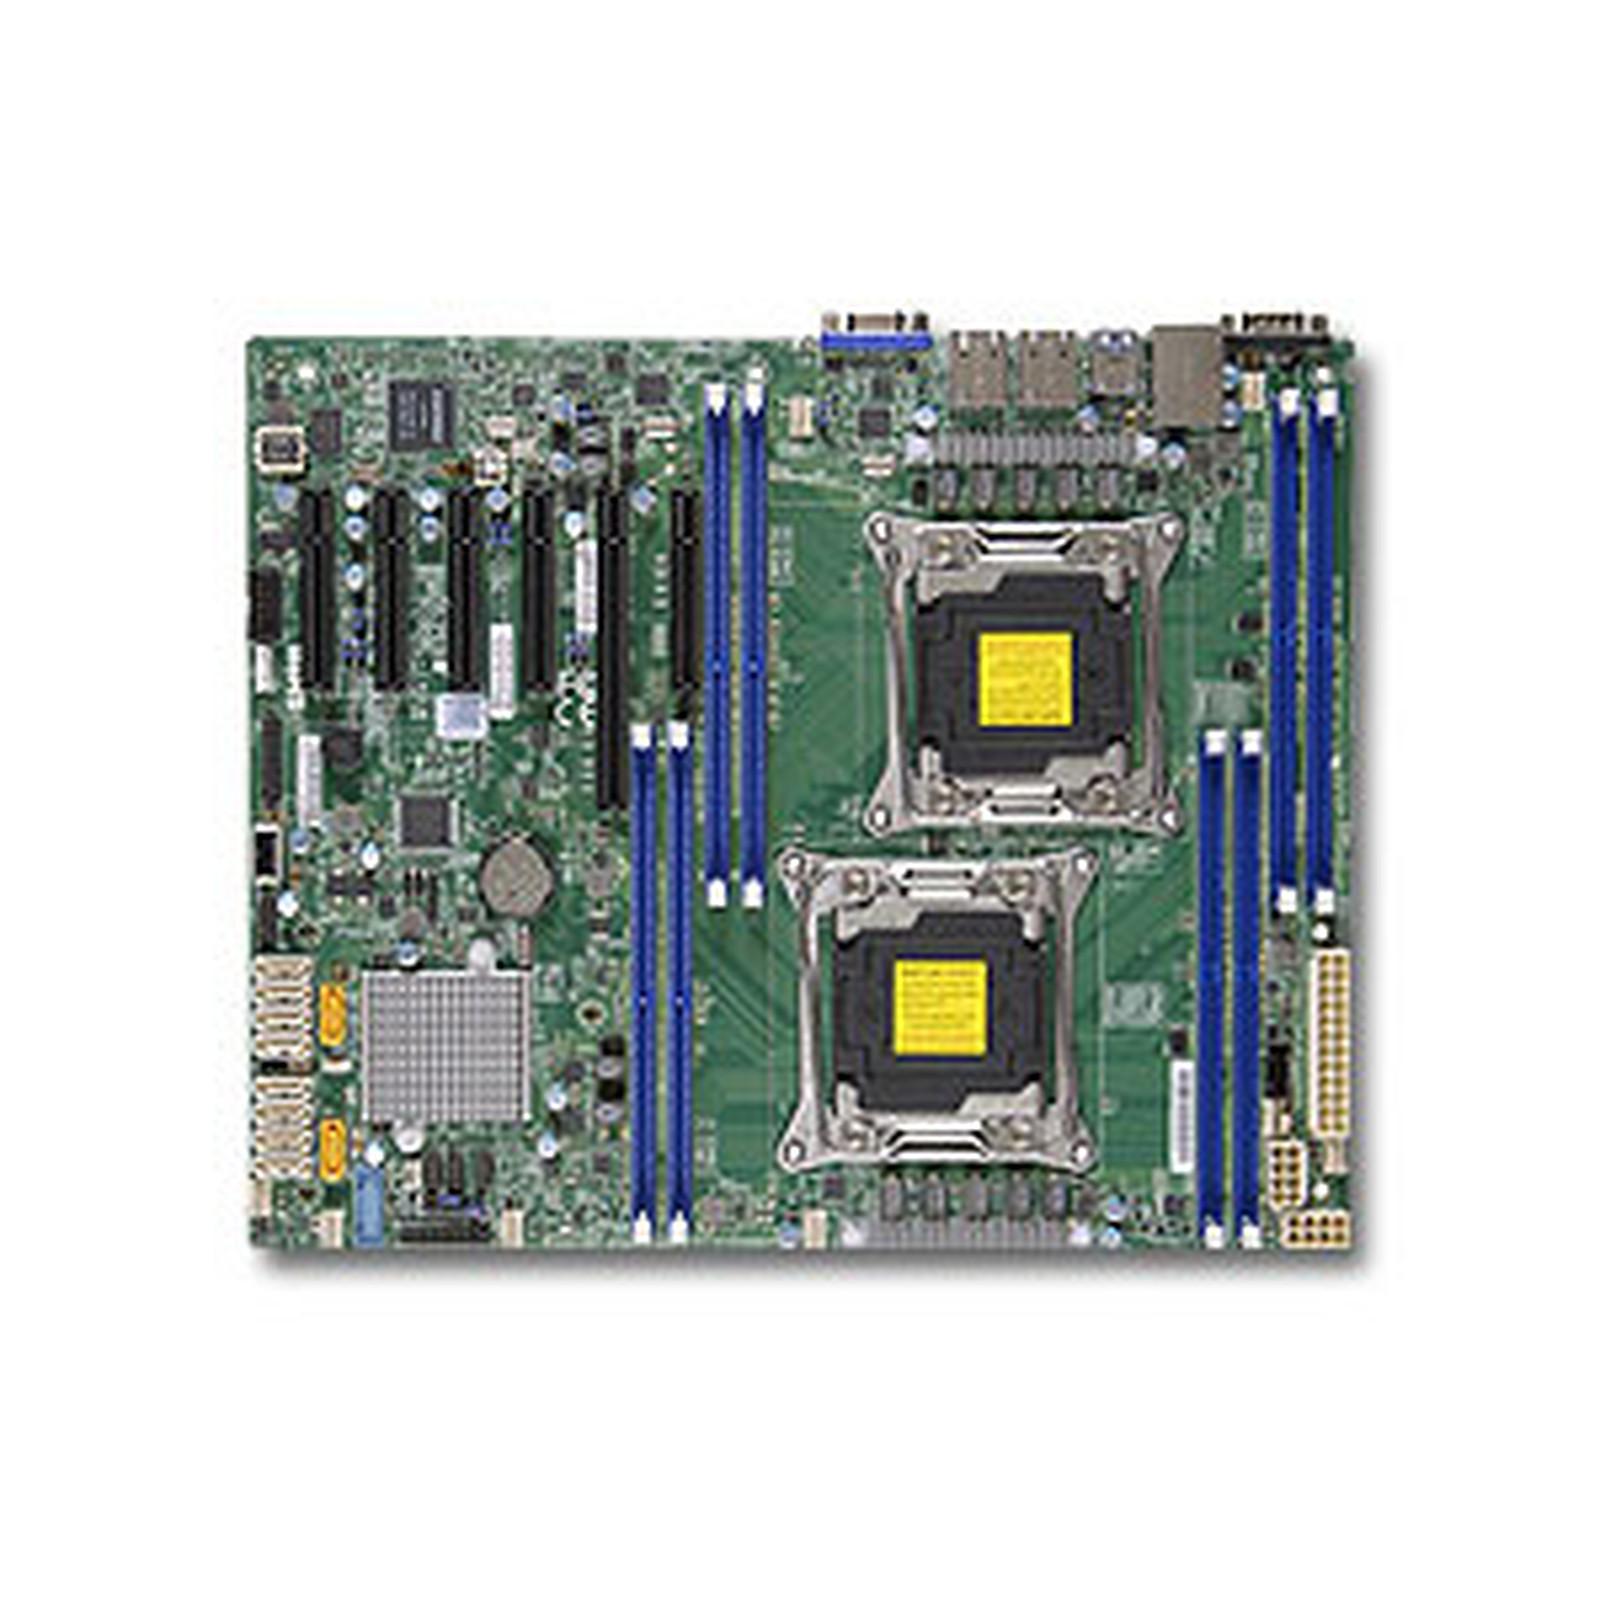 SuperMicro X10DRL-I